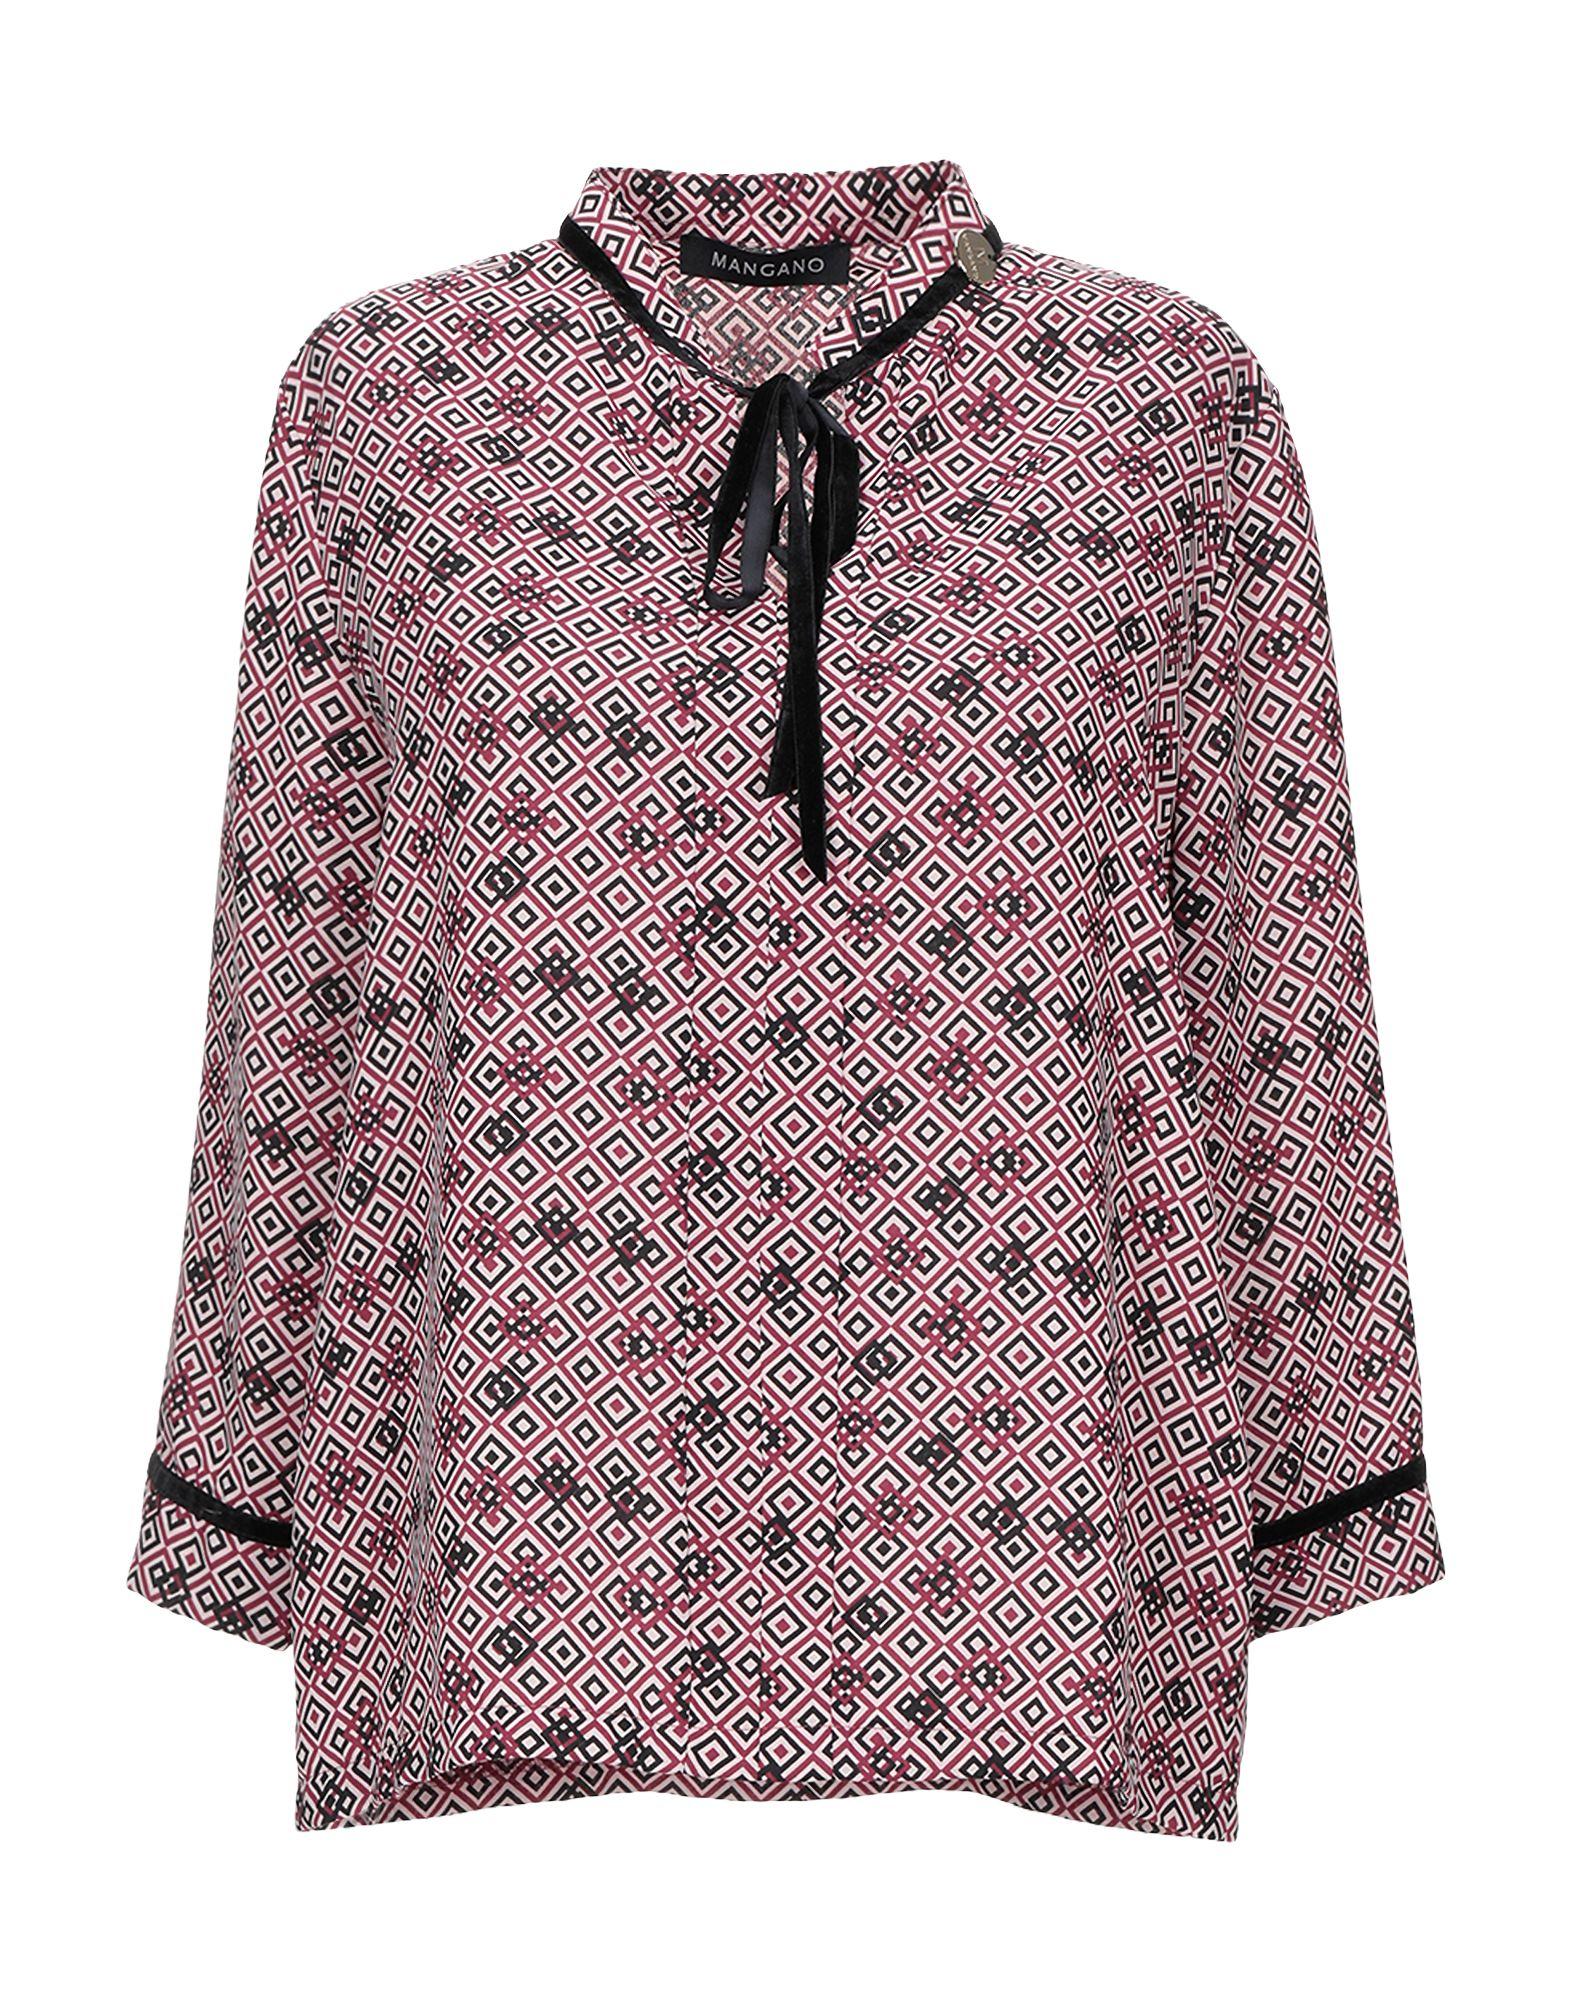 цены на MANGANO Блузка  в интернет-магазинах